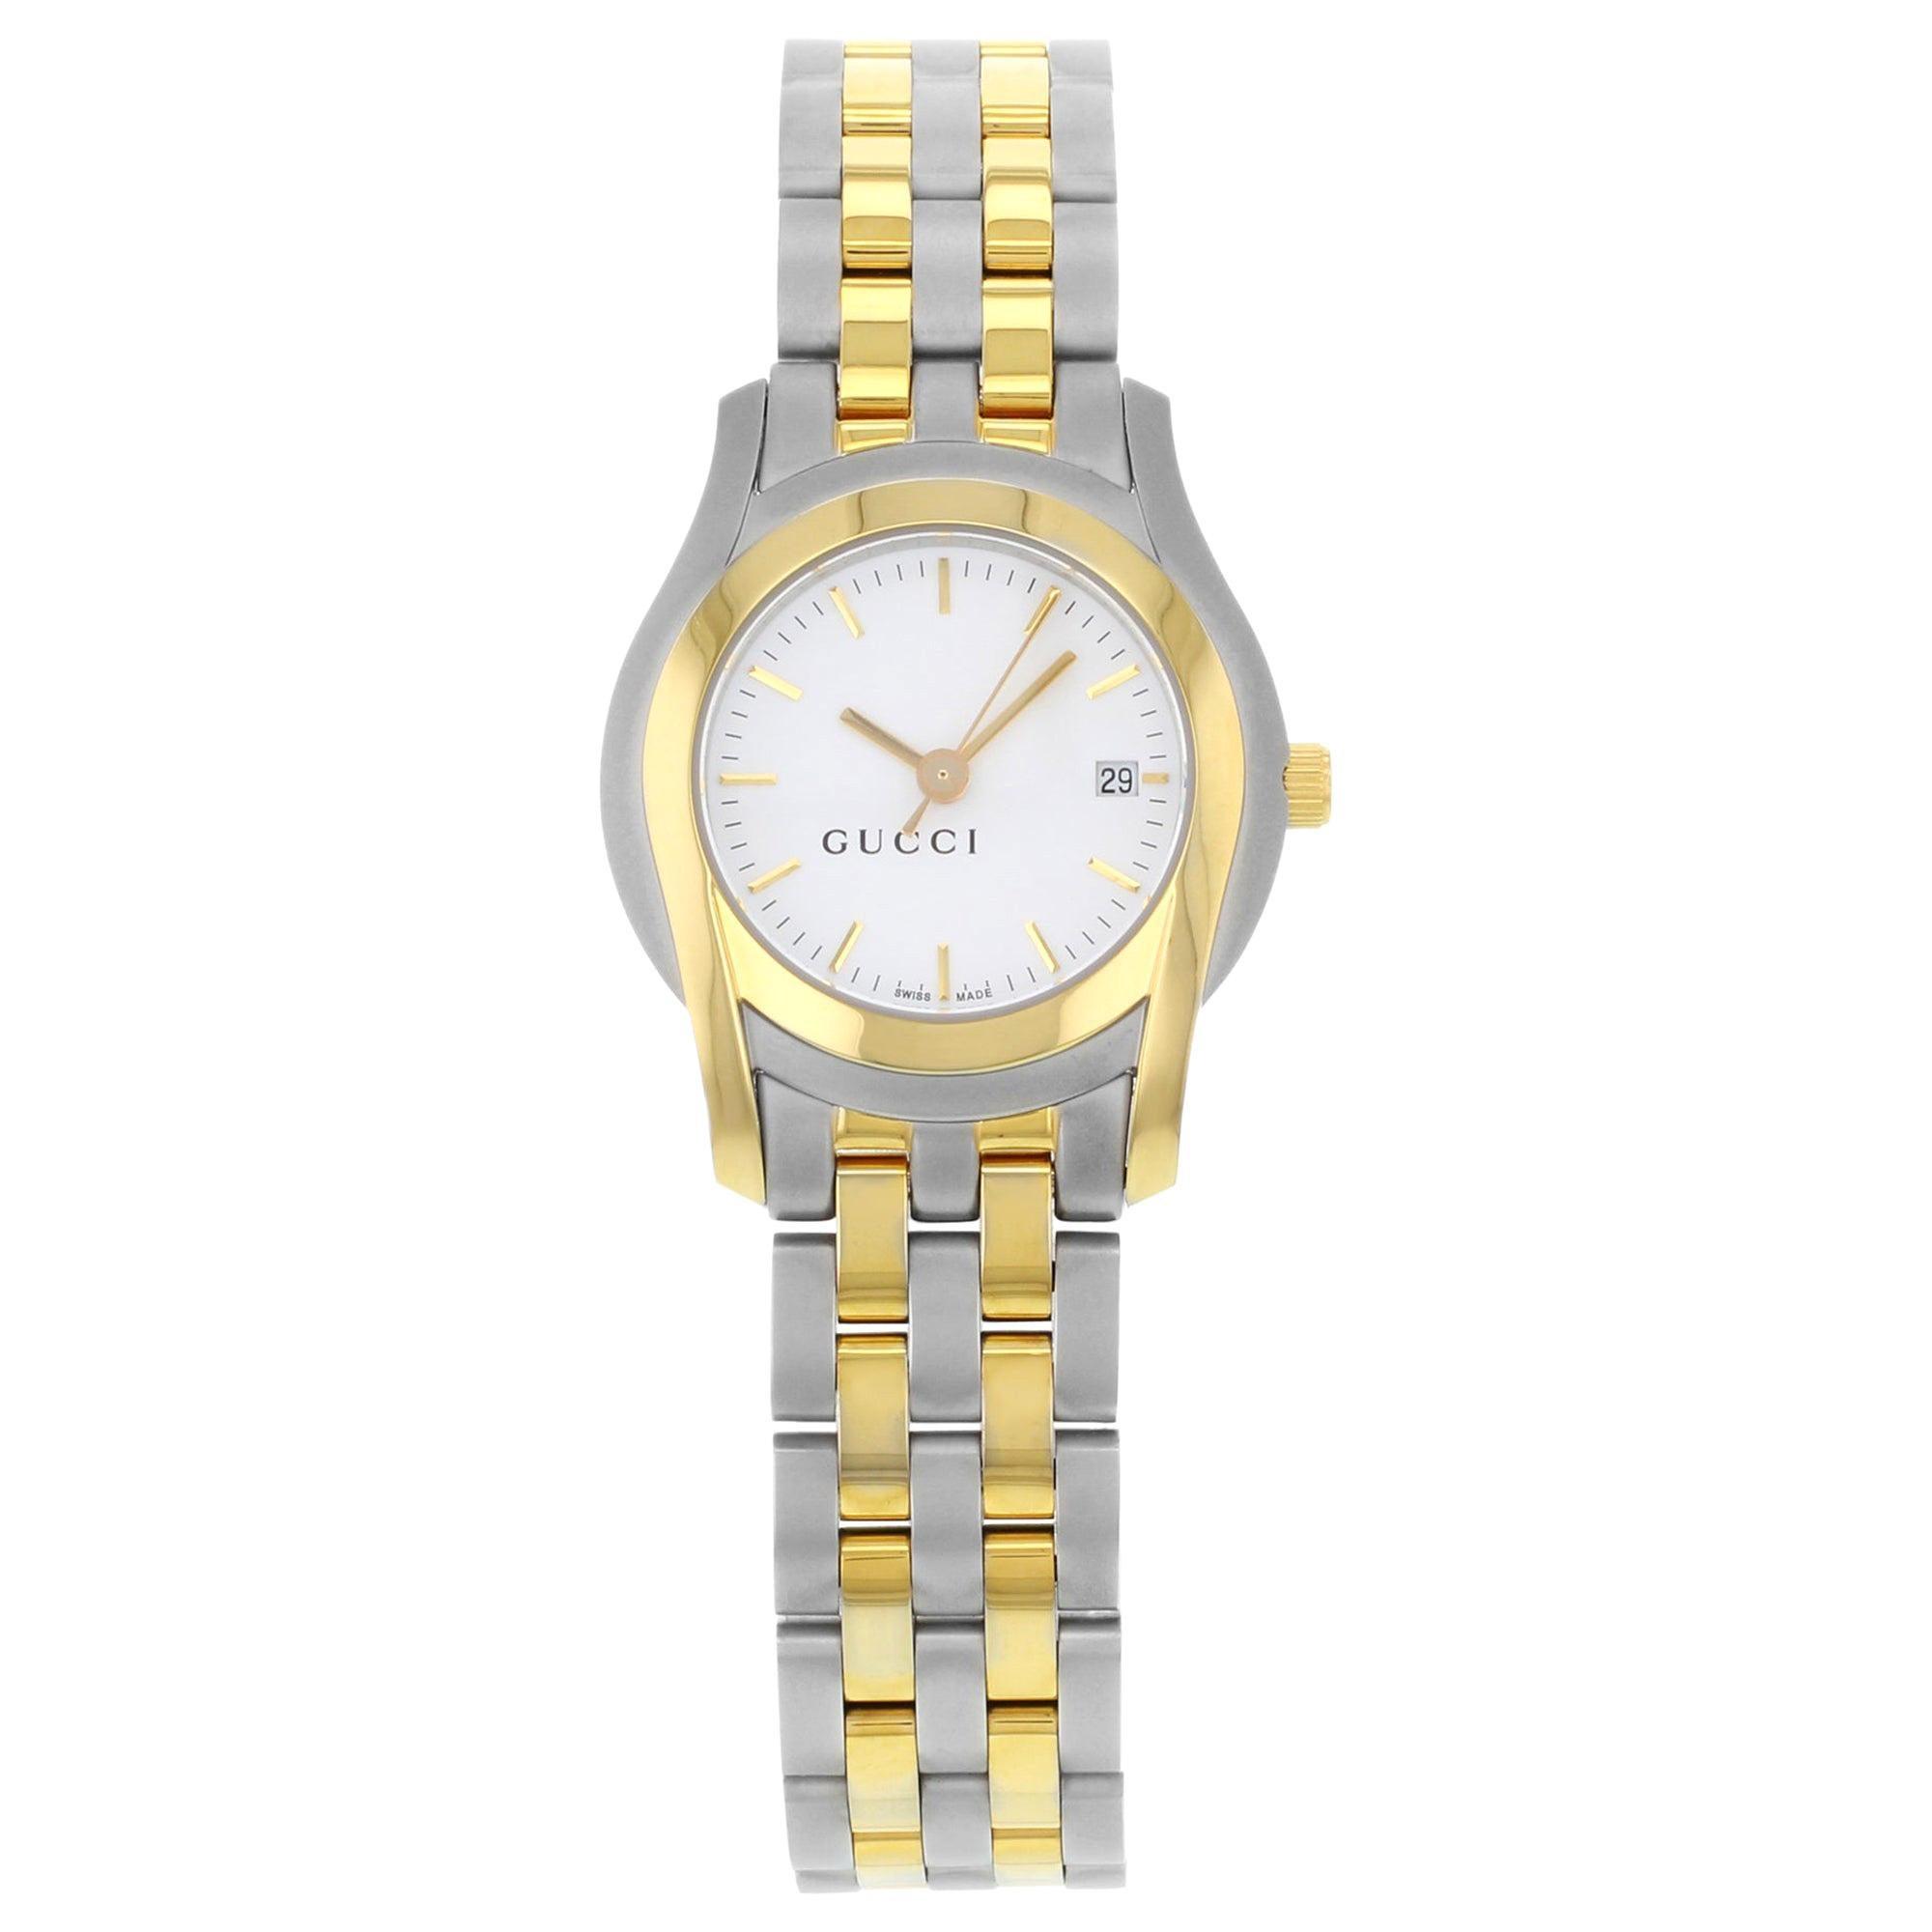 Gucci 5500L Gold Tone Stainless Steel White Dial Quartz Ladies Watch YA055528